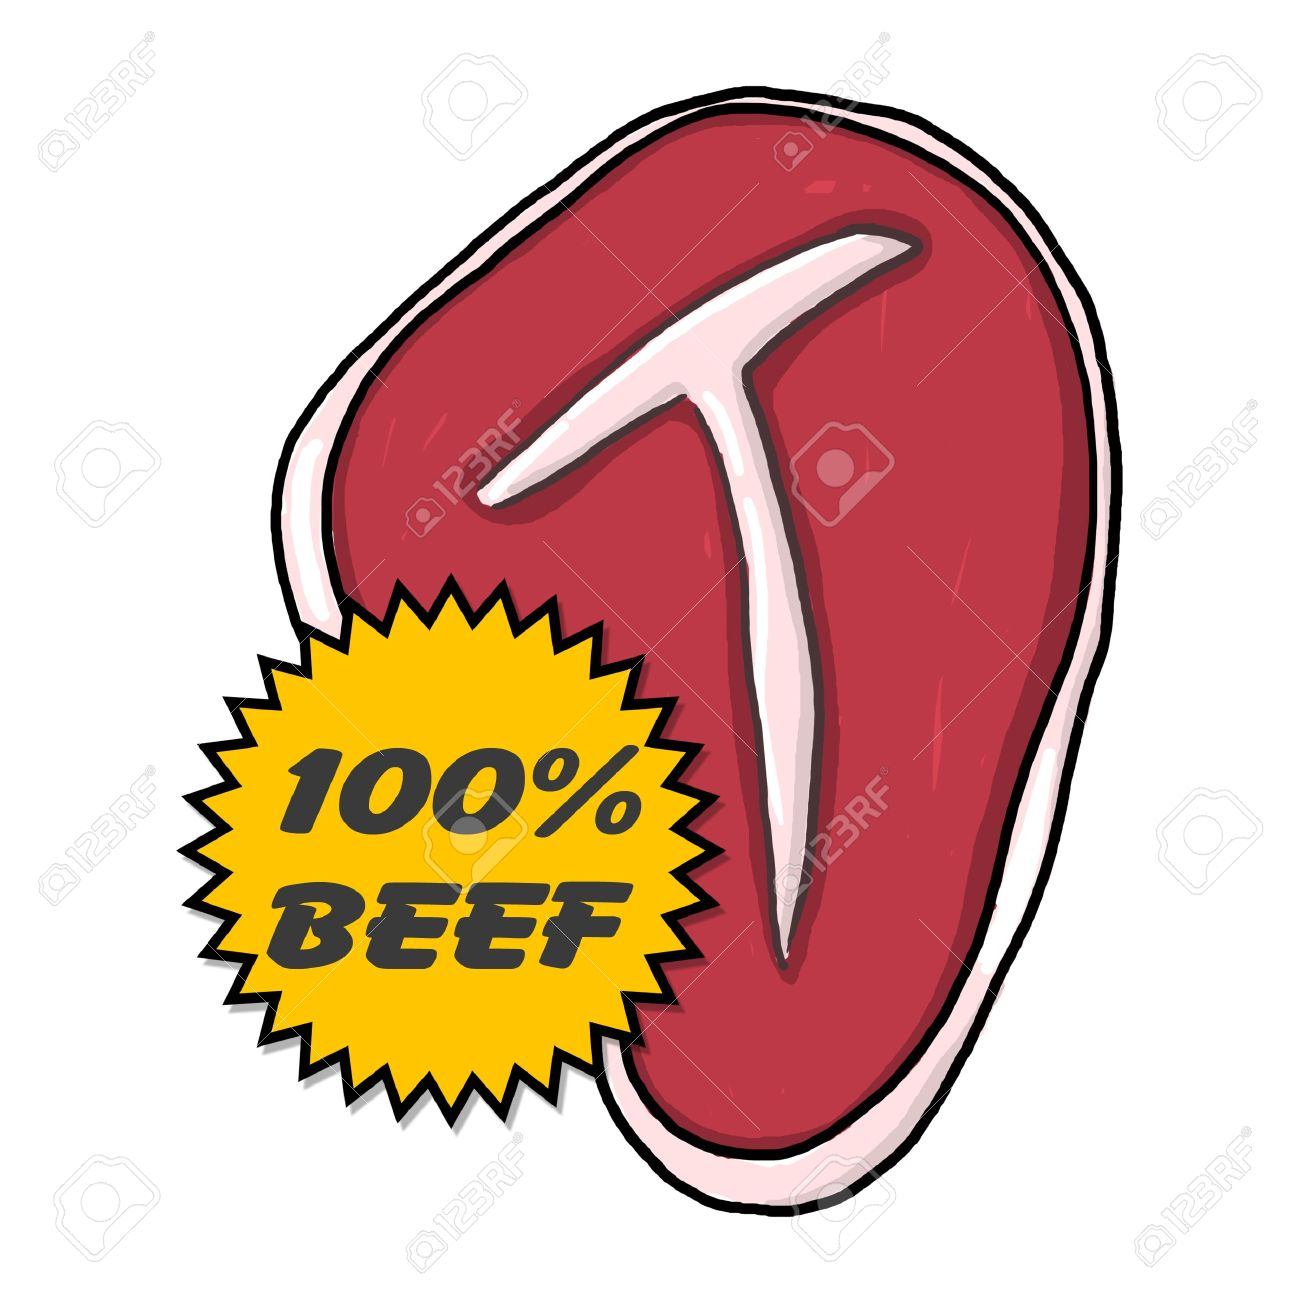 1300x1300 Steak Illustration Juicy Steak With 100% Beef Seal T Bone Steak